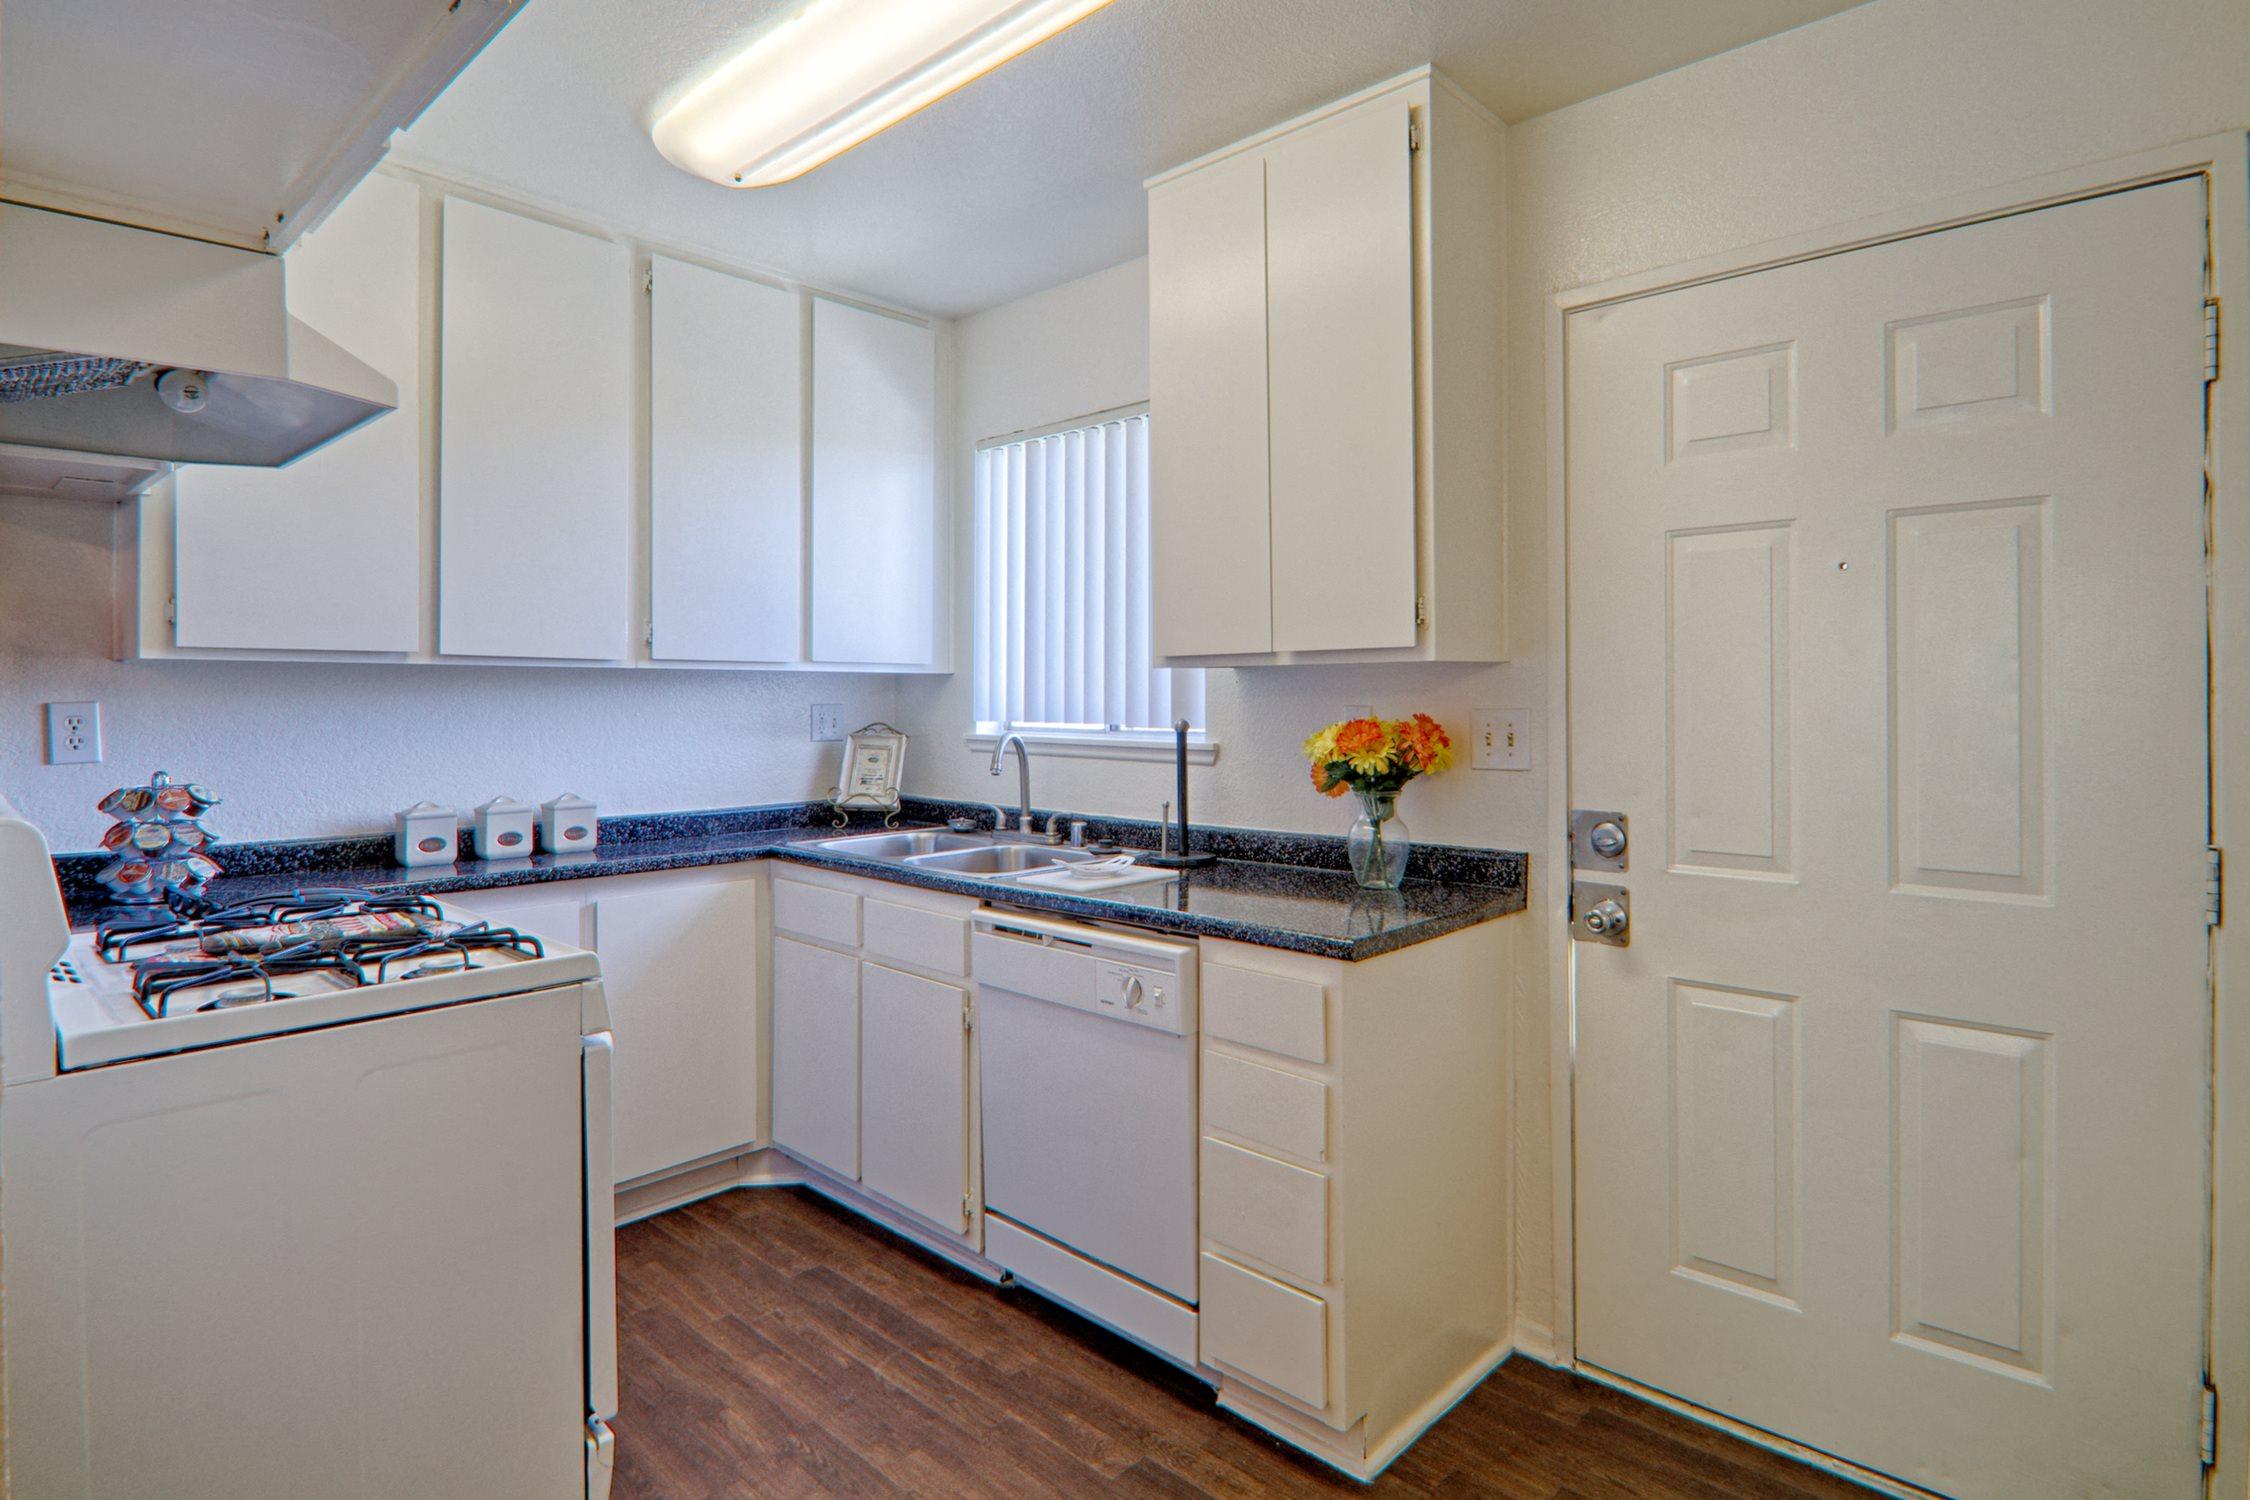 Modern Kitchen at Woodlands West Townhomes, Lancaster, CA,93536